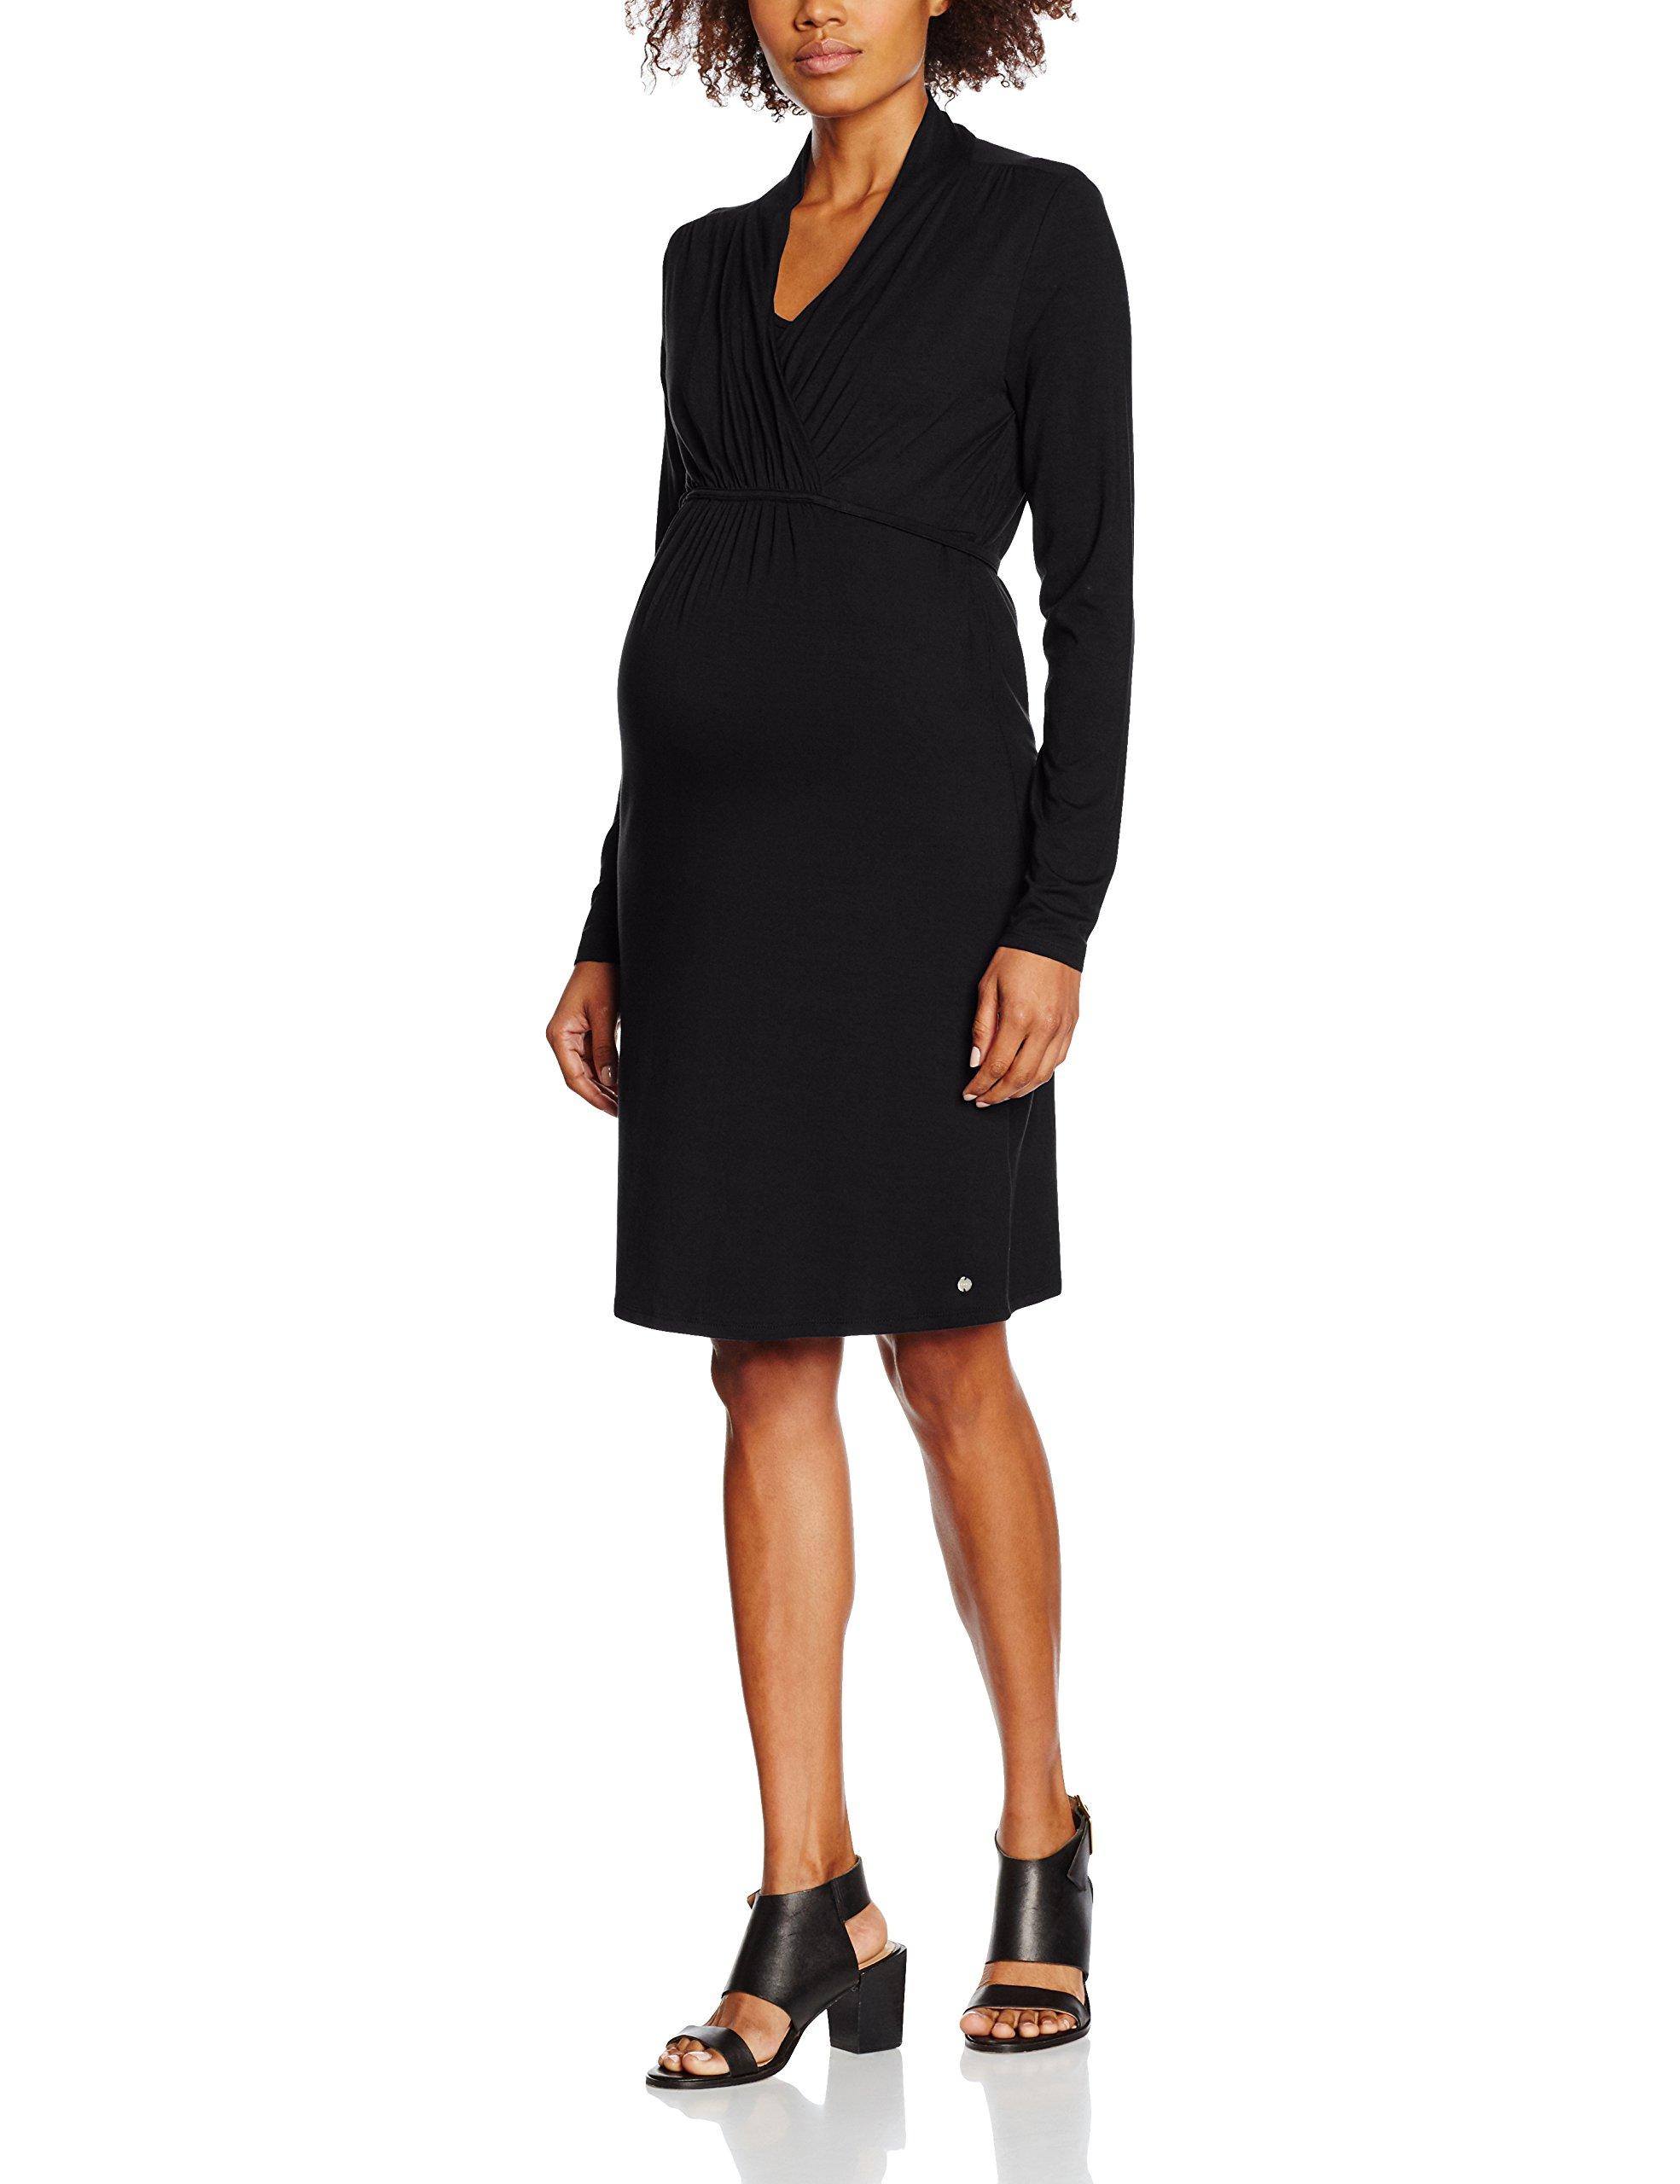 Ls 00142 Esprit Dress Maternity M84280 Nursing Robe Femme MaternitéSchwarzblack De AR54qL3j